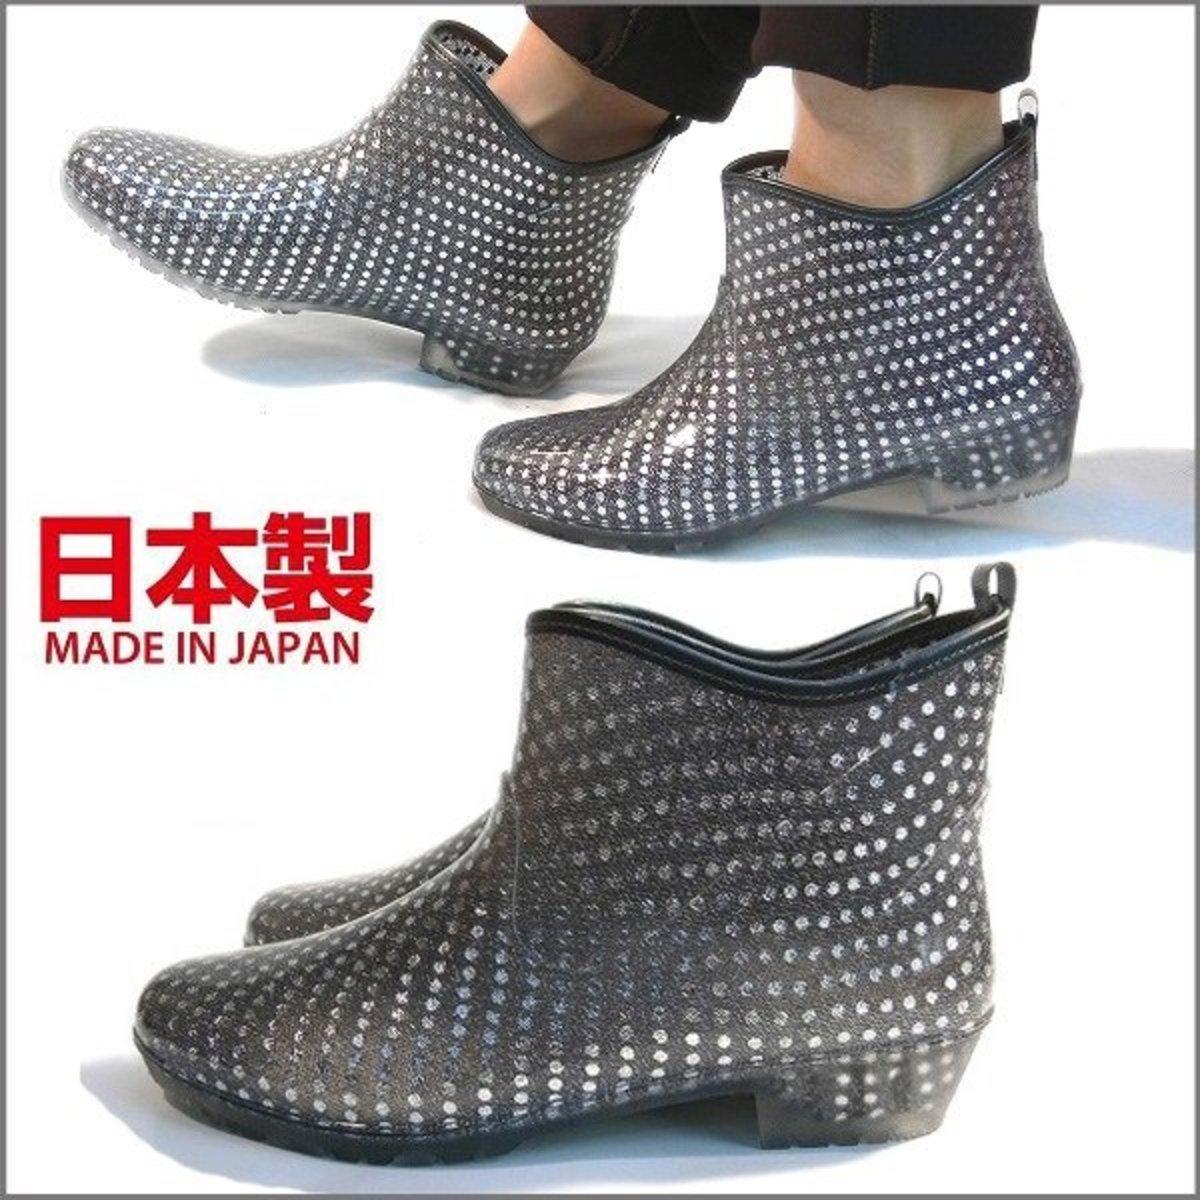 993569f600d8e Japan Made Short Rain Boots – Sequin Black (781)